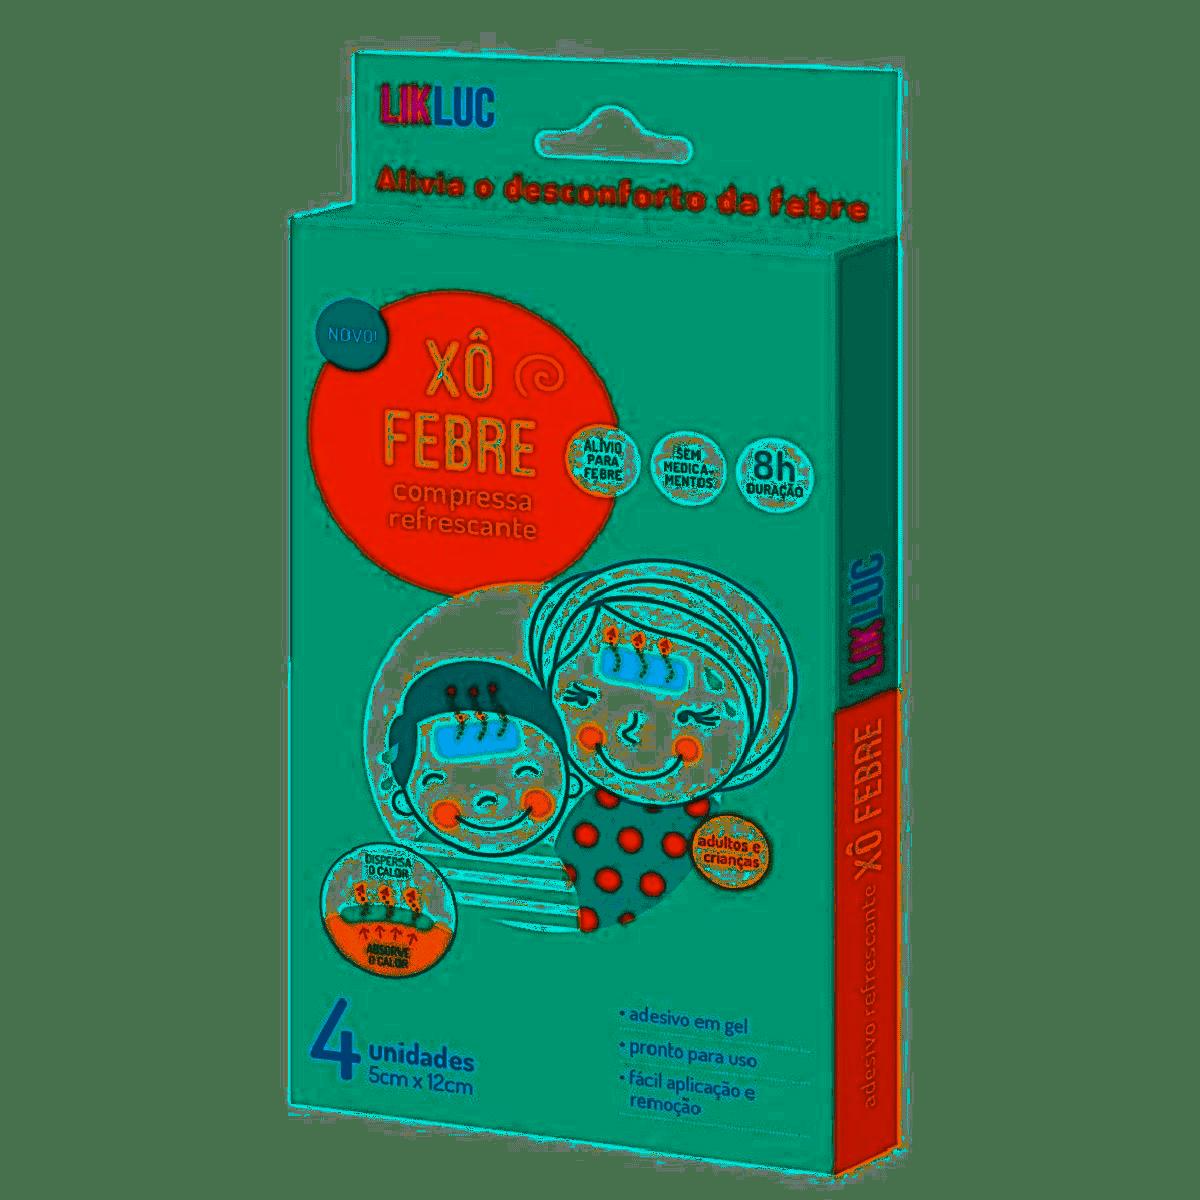 licluk-xo-febre-compressa-refrescante